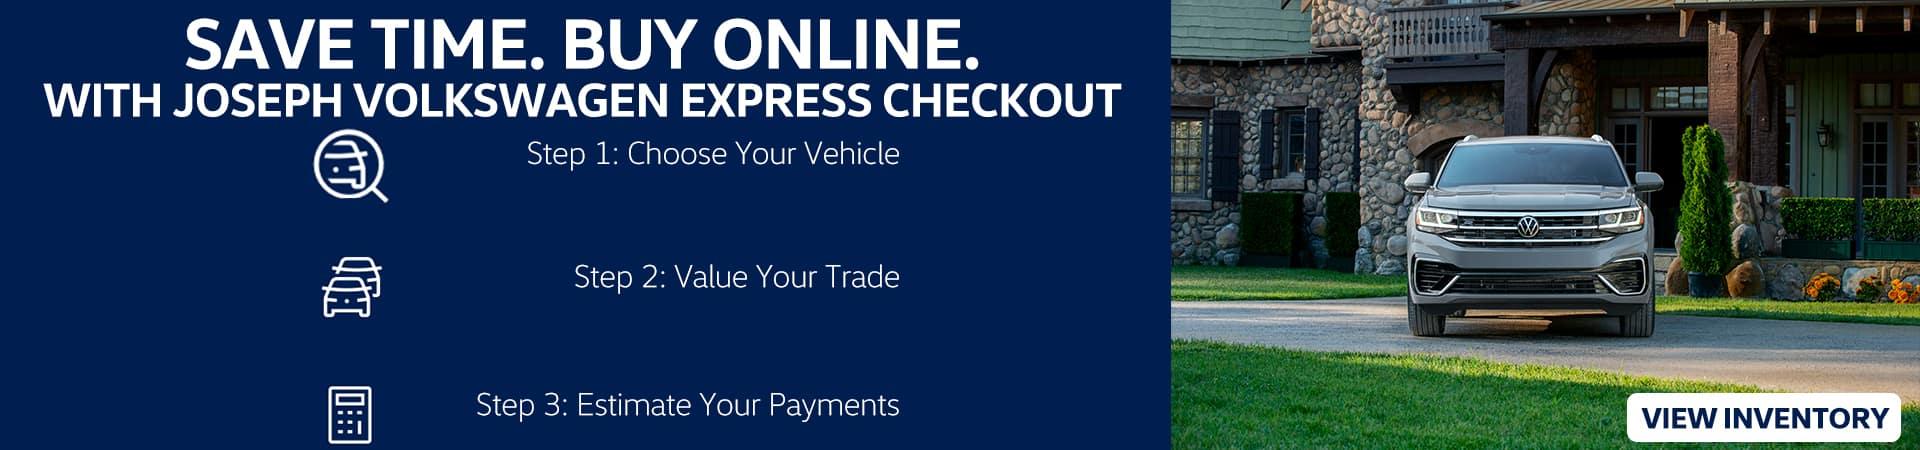 Save Time, Buy Online | Joseph Volkswagen of Cincinnati | Cincinnati, OH